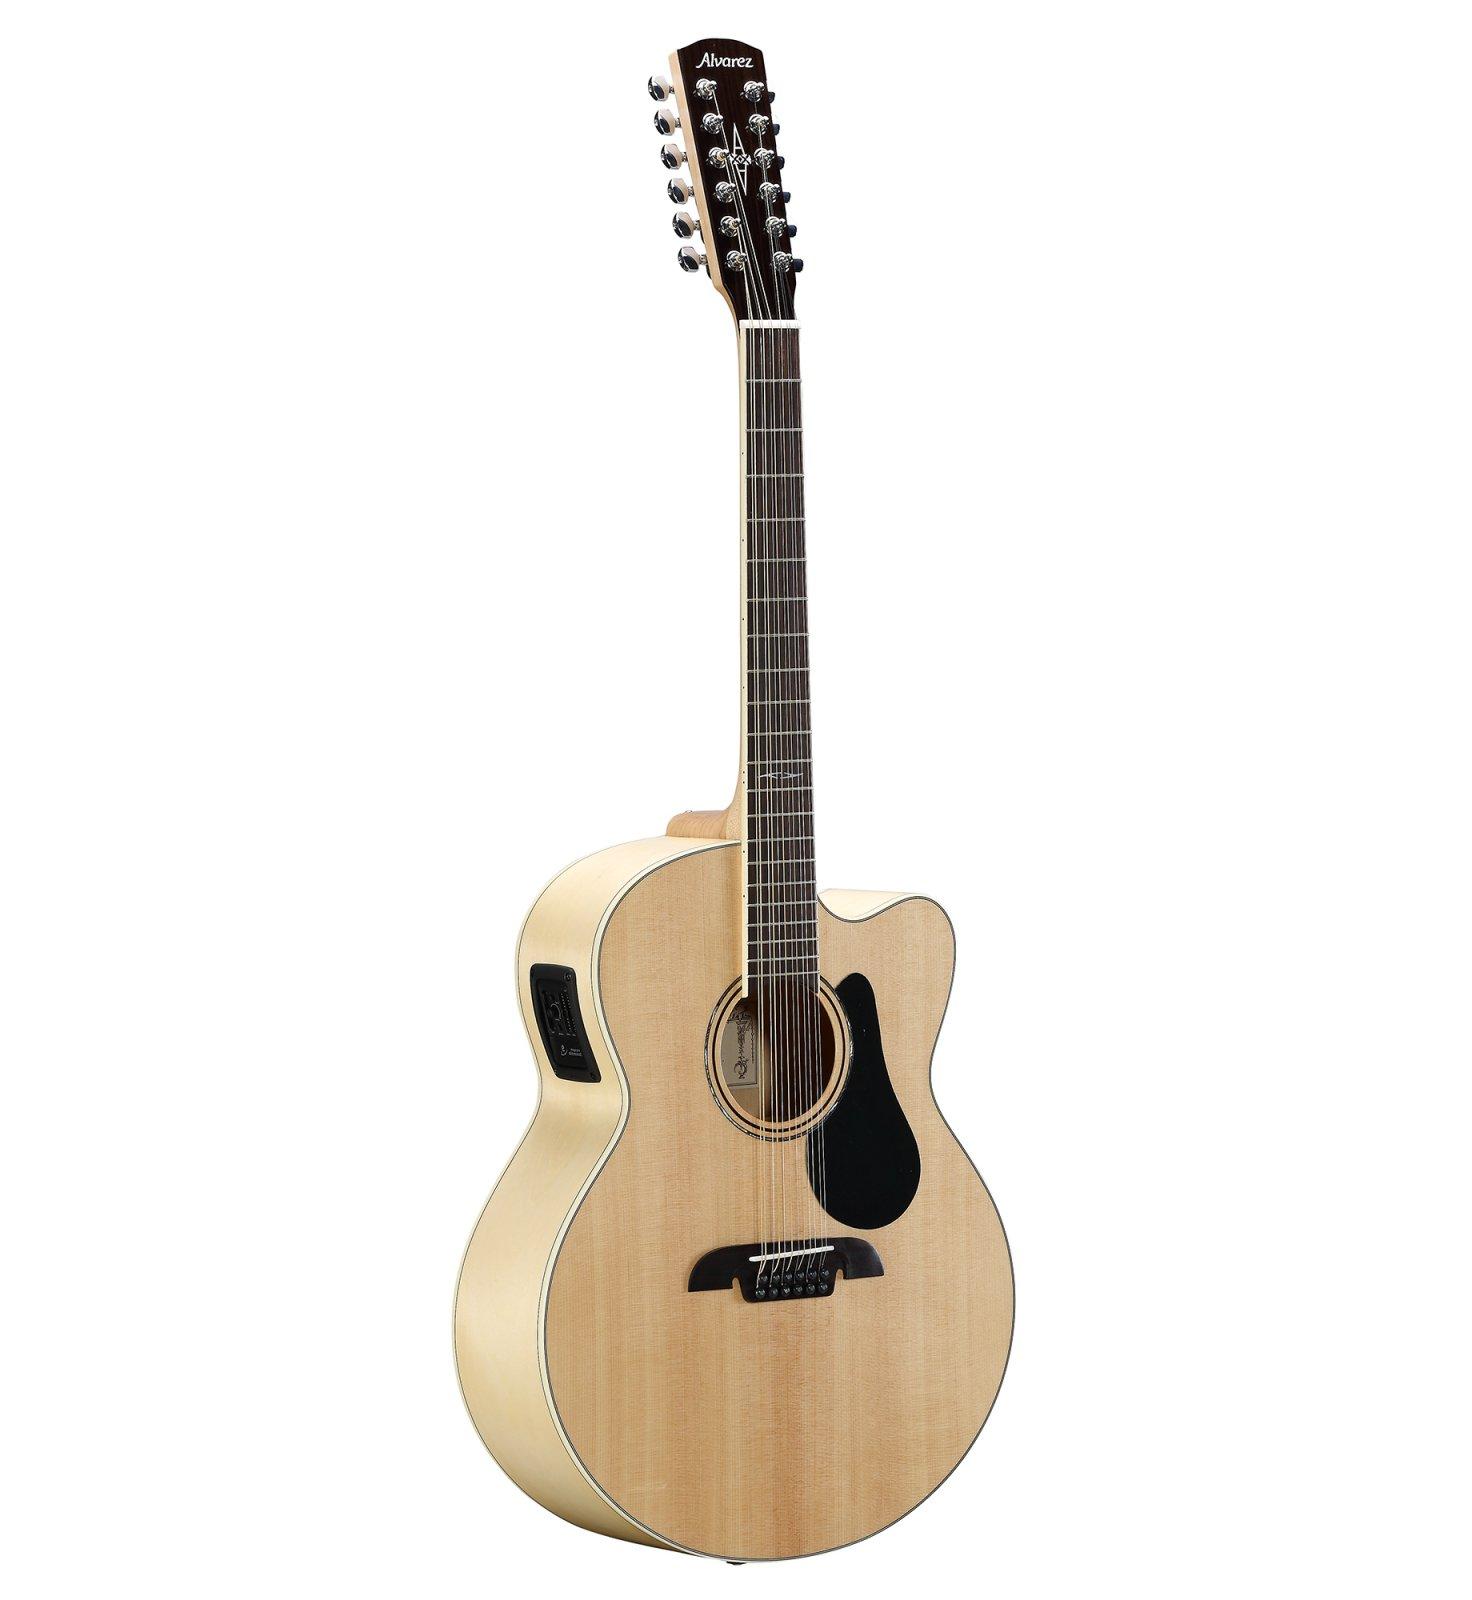 Alvarez AJ80CE-12 Artist Jumbo Acoustic-Electric 12 String w/ Cutaway, EQ & Tuner